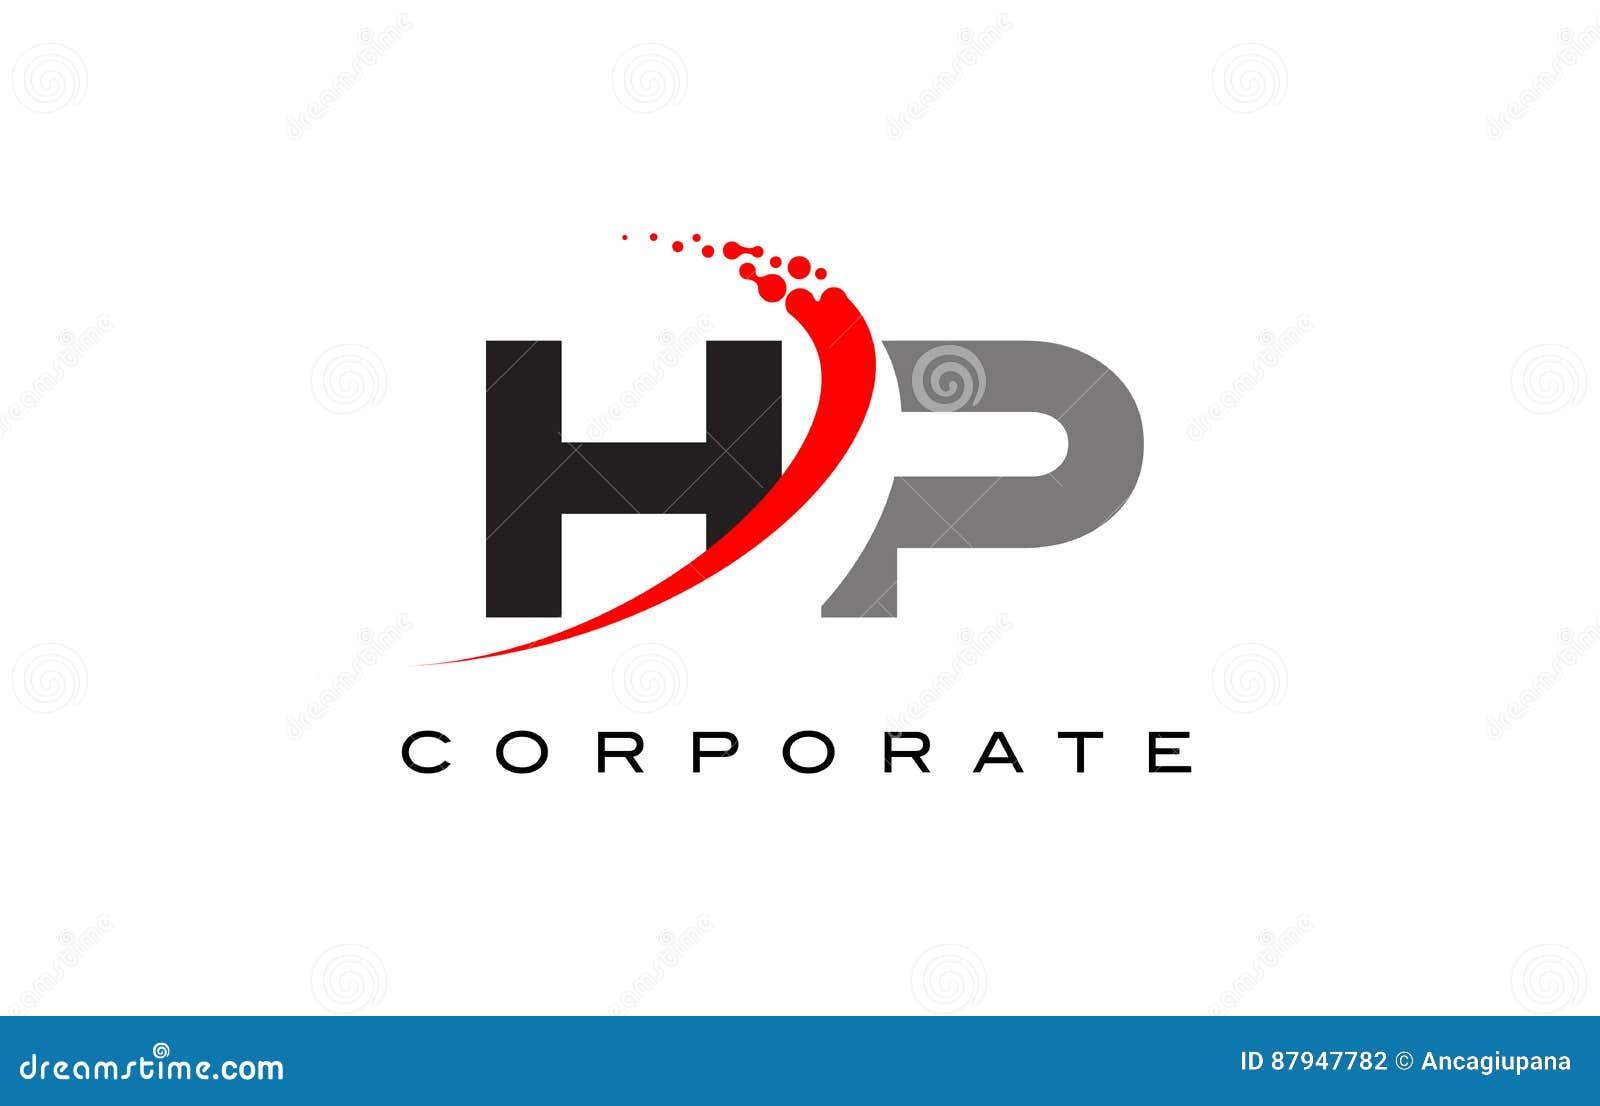 HP Modern Letter Logo Design with Swoosh